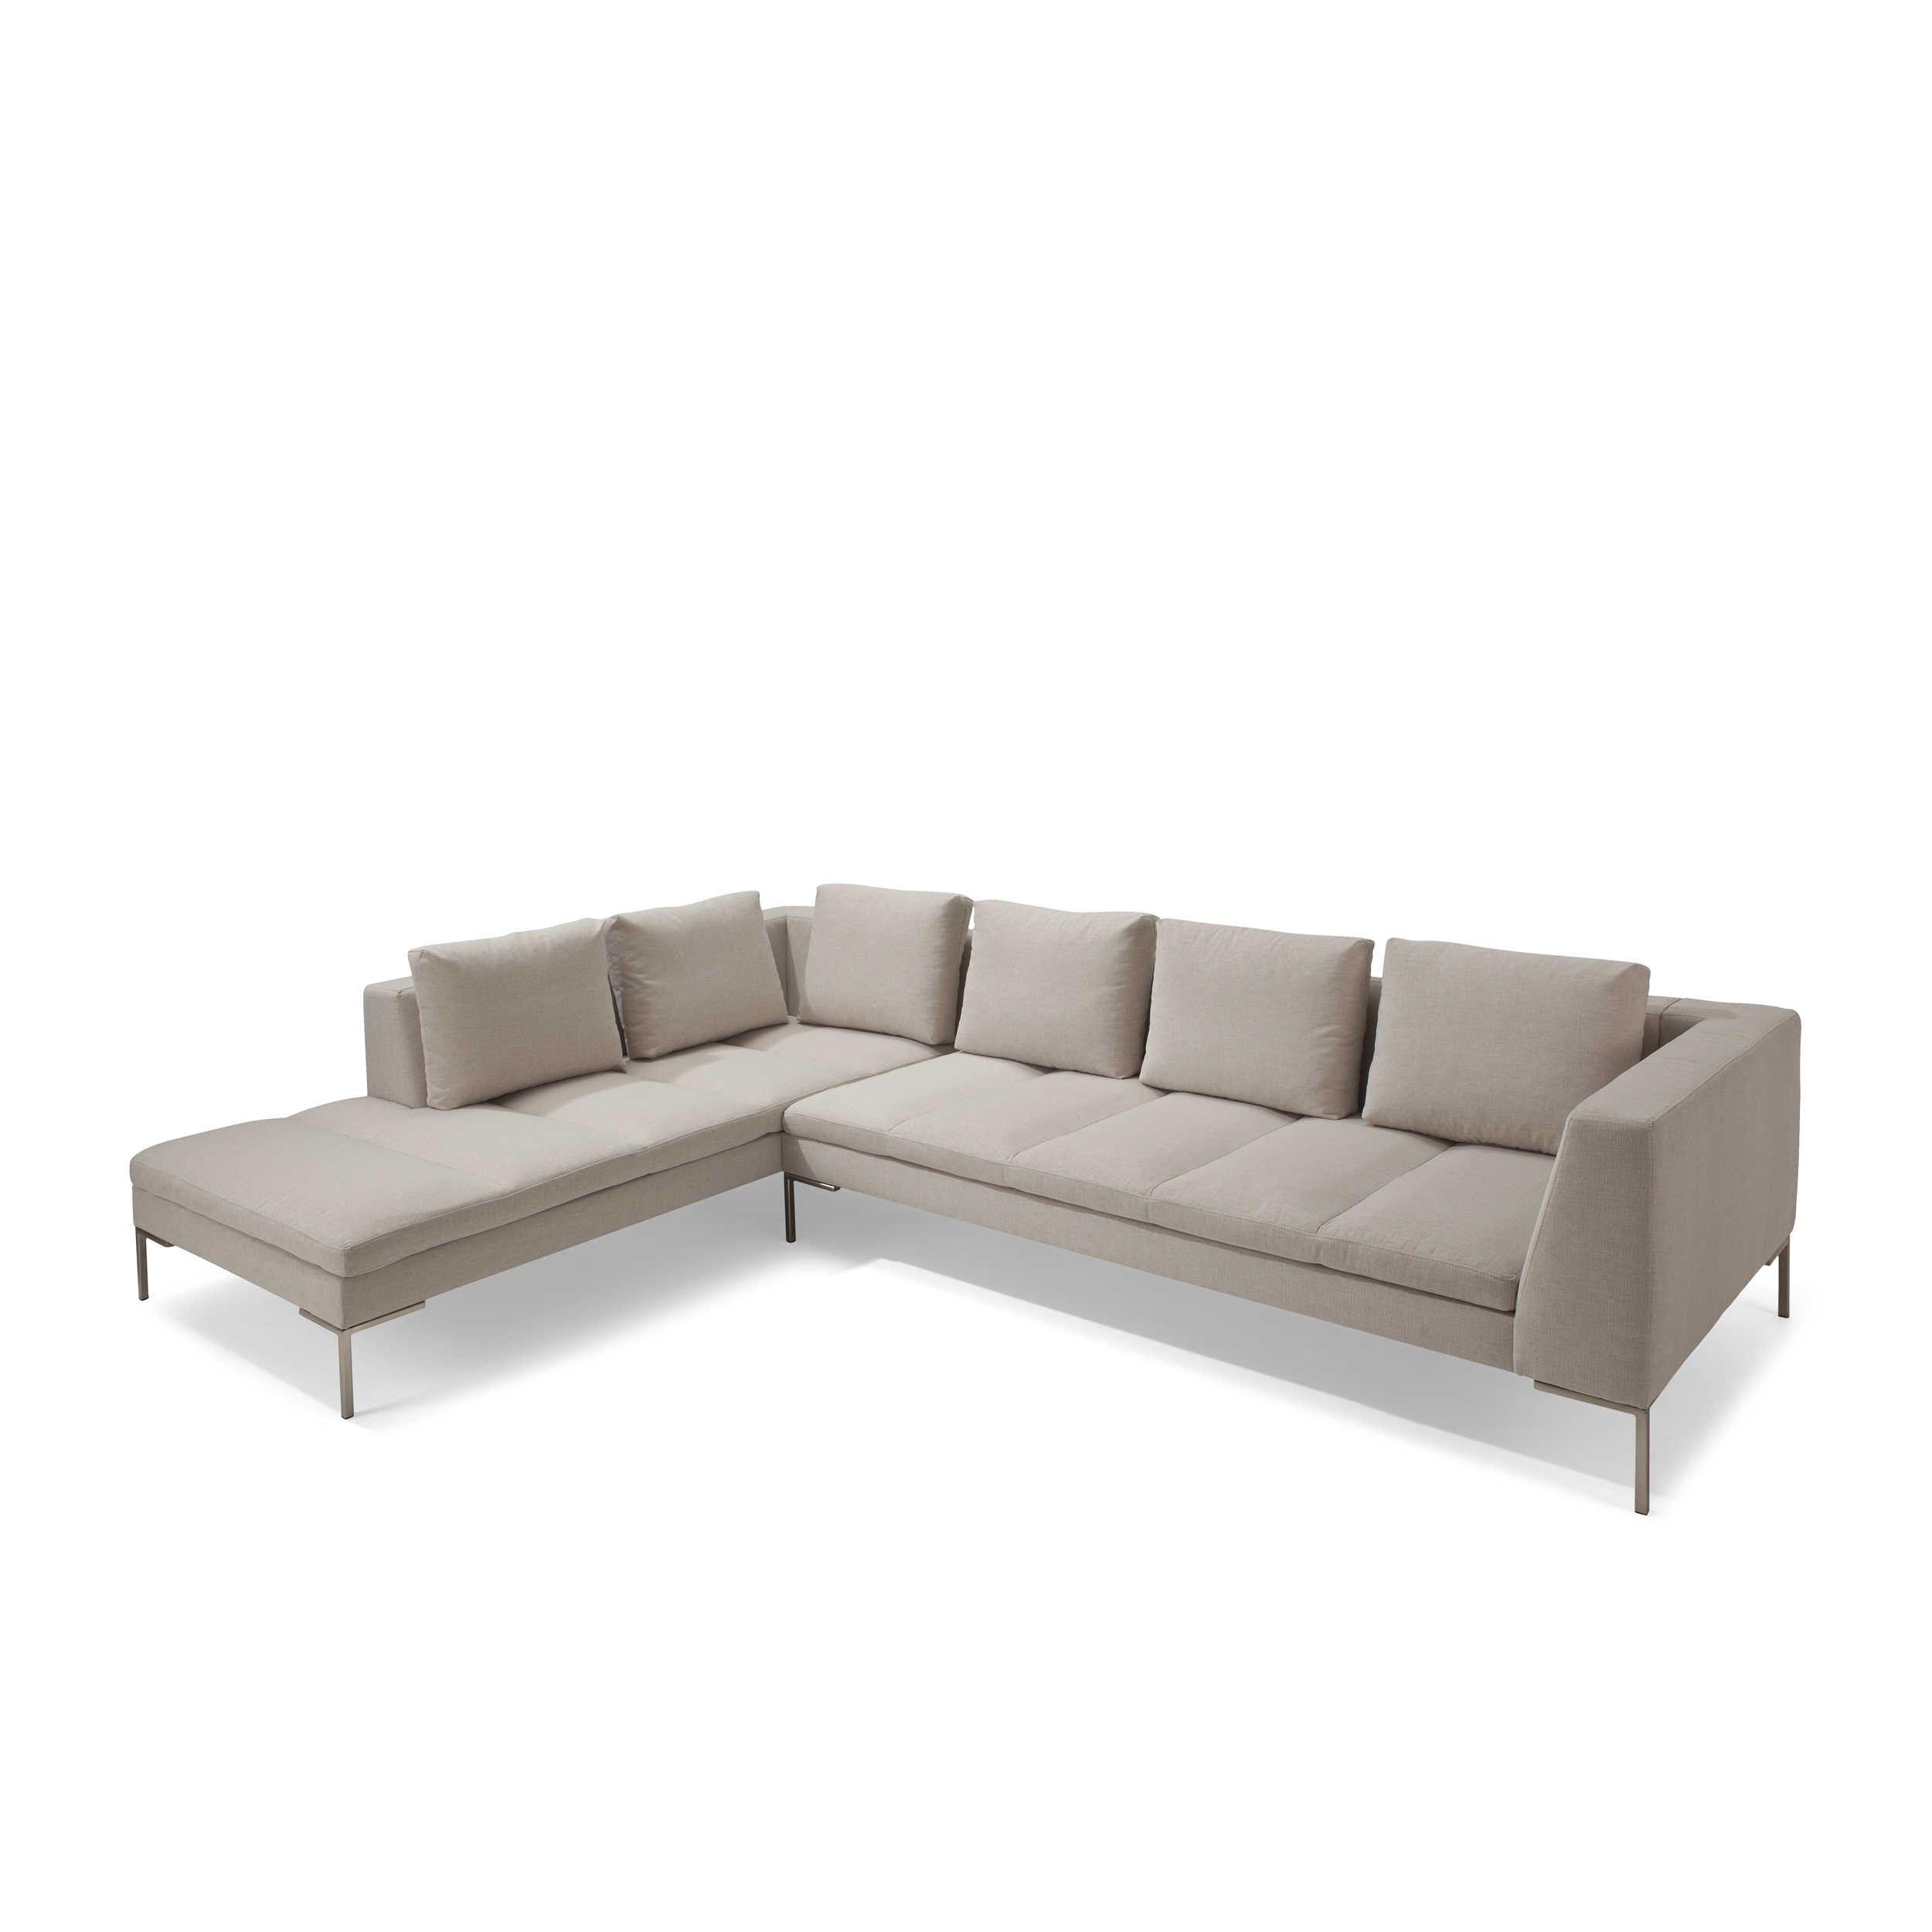 Theca Ecksofa Mondovi Beige Stoff | Couch, Sofa, Furniture